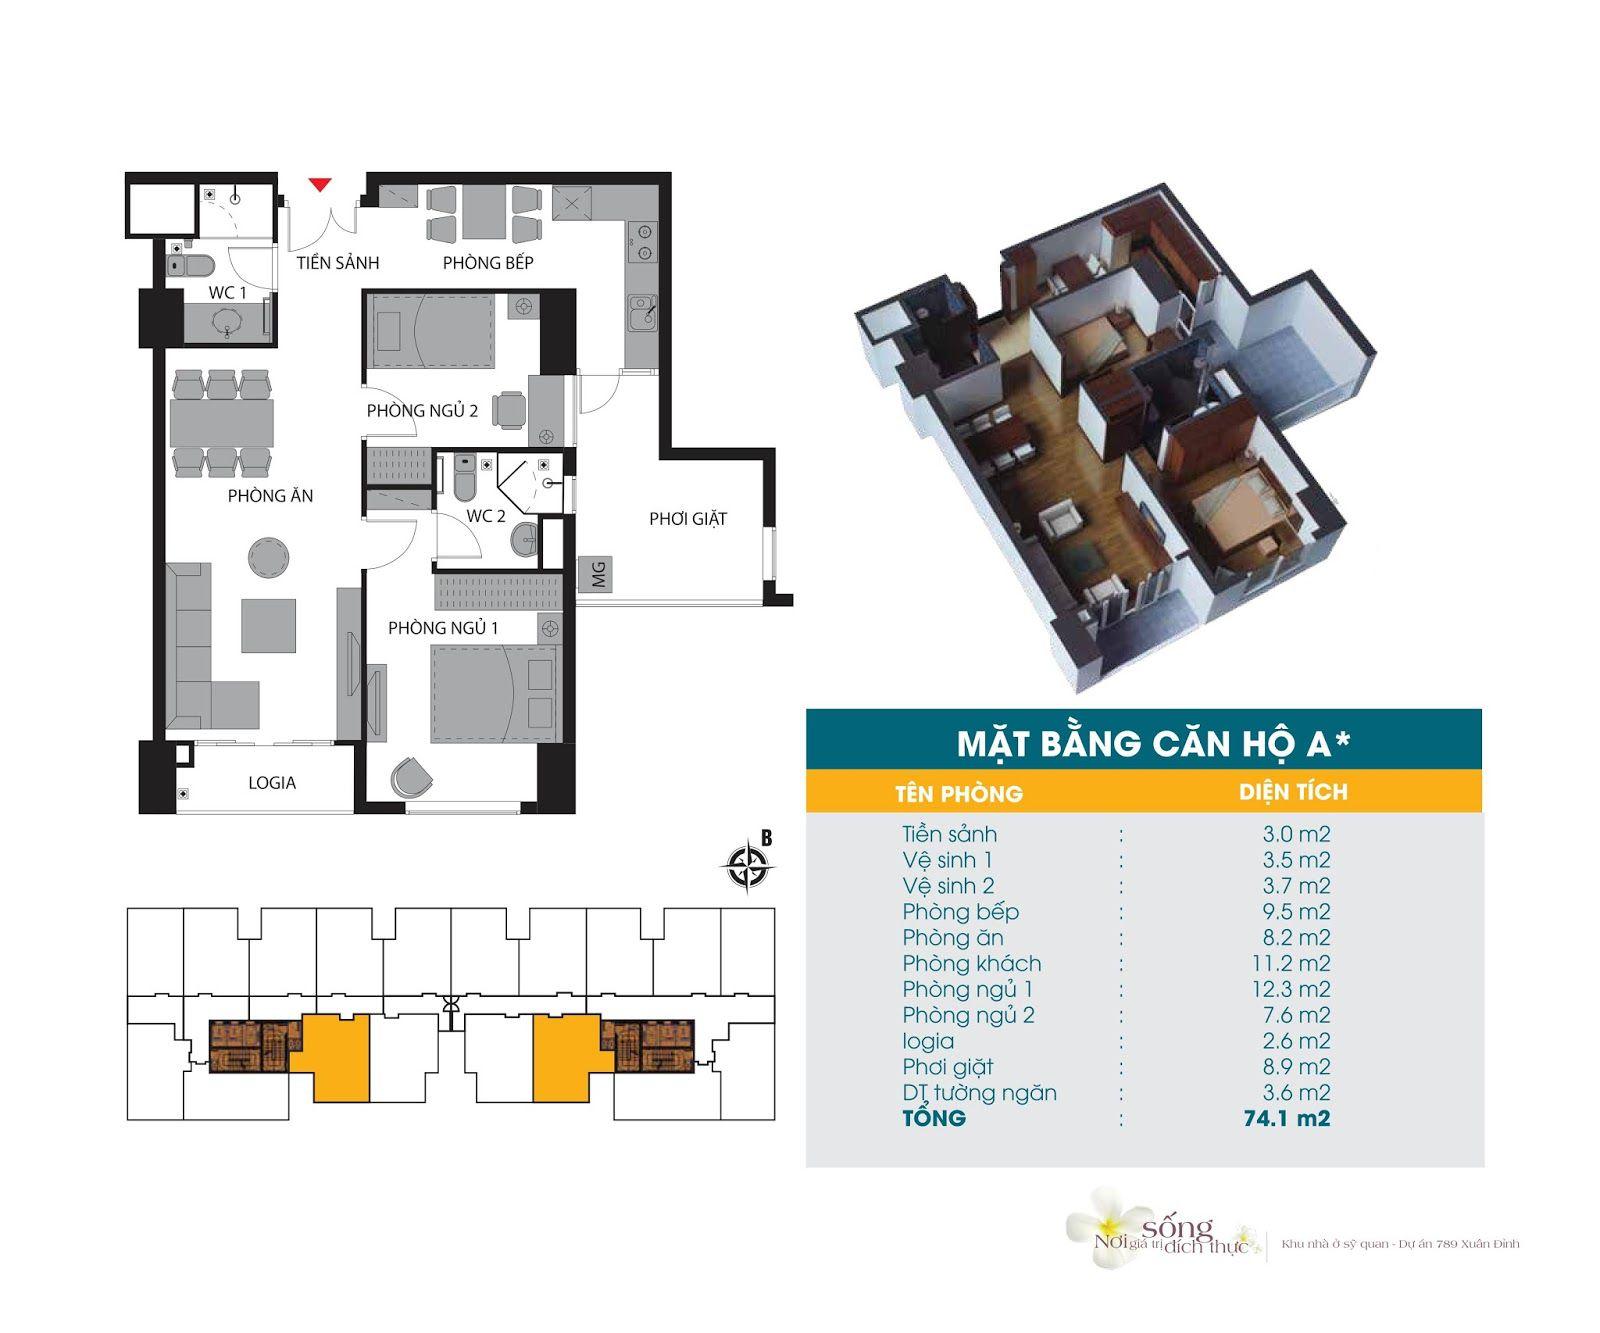 Căn hộ 74,1 m2